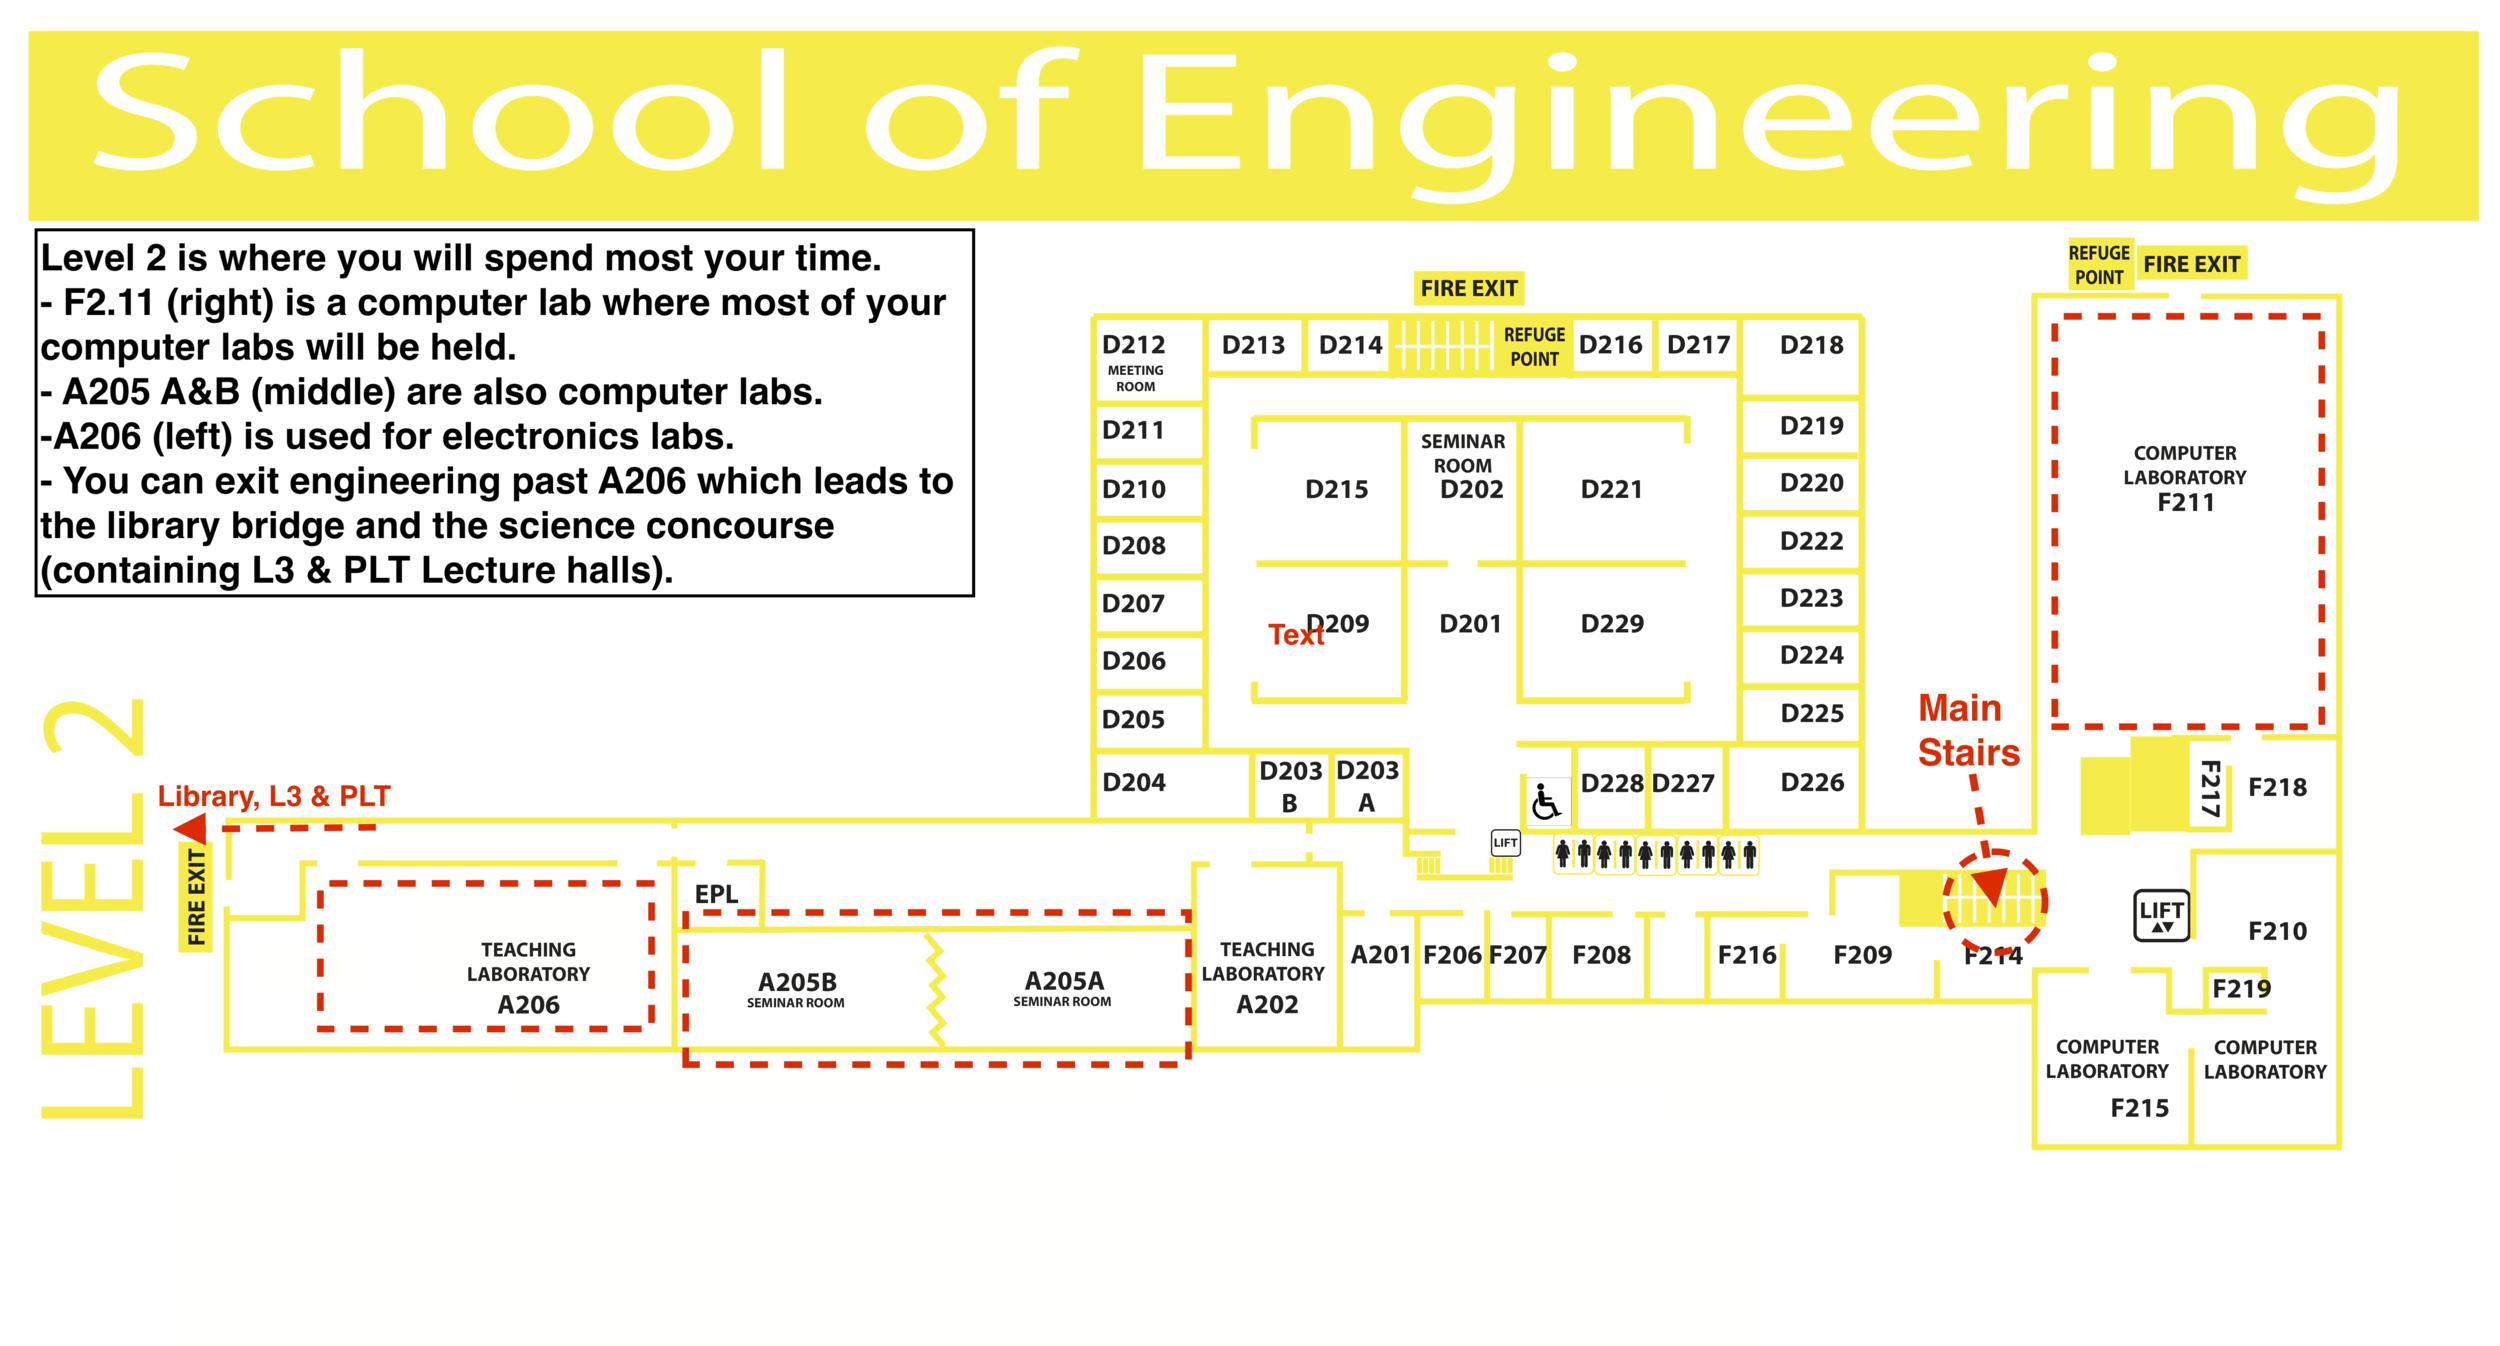 Level 2 - Engineering